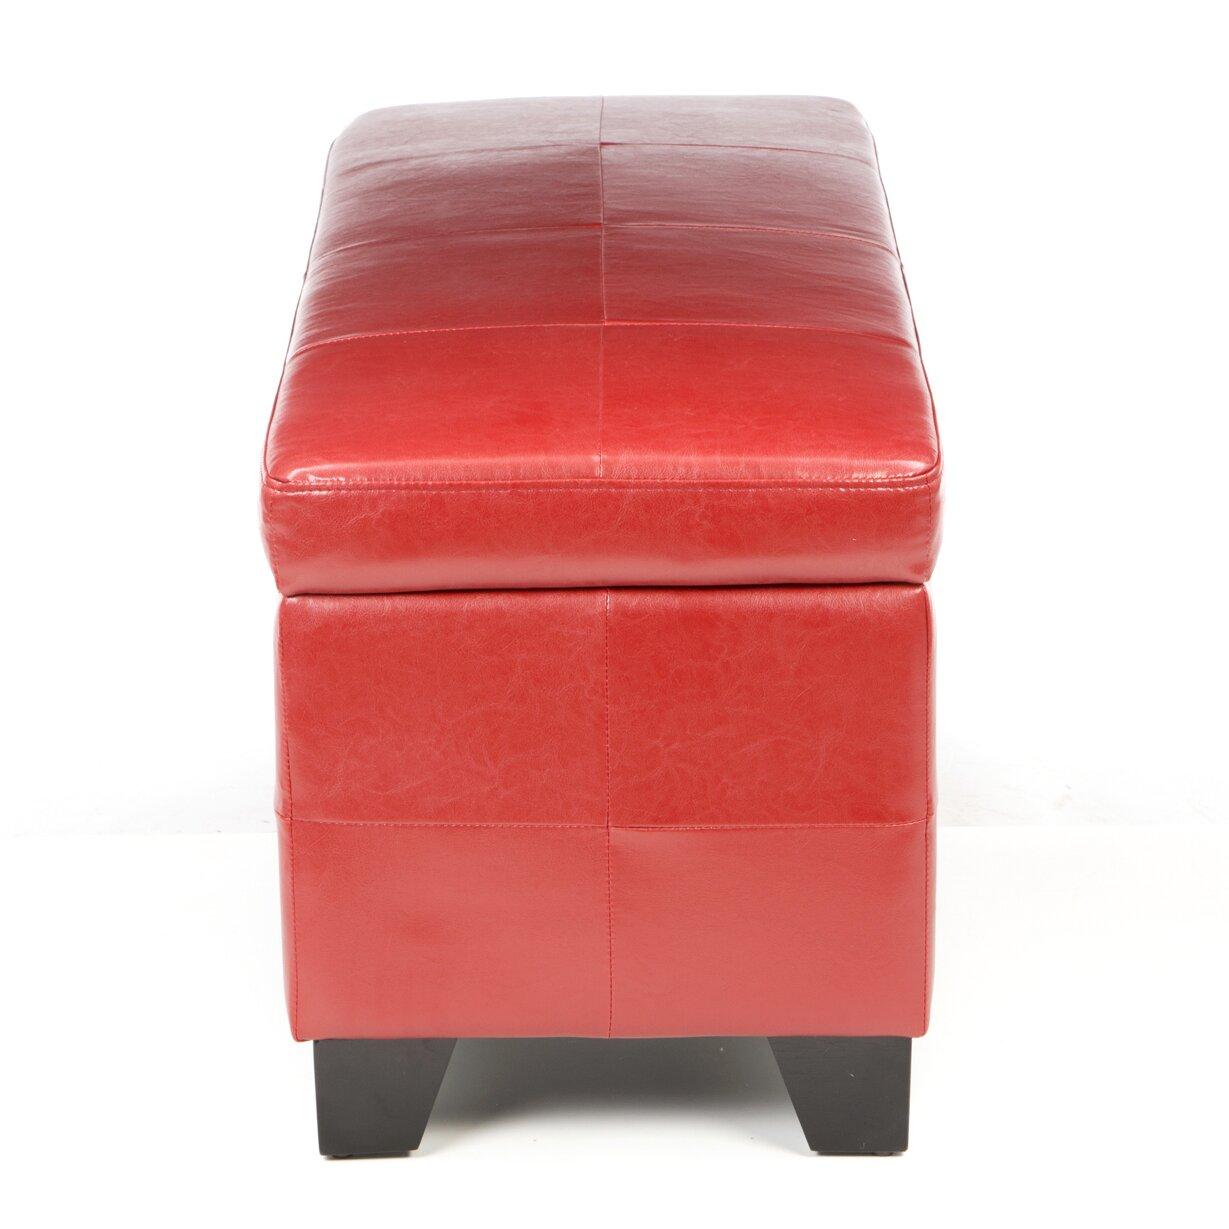 Milano Bedroom Furniture Red Barrel Studio West Seattle Upholstered Storage Bedroom Bench